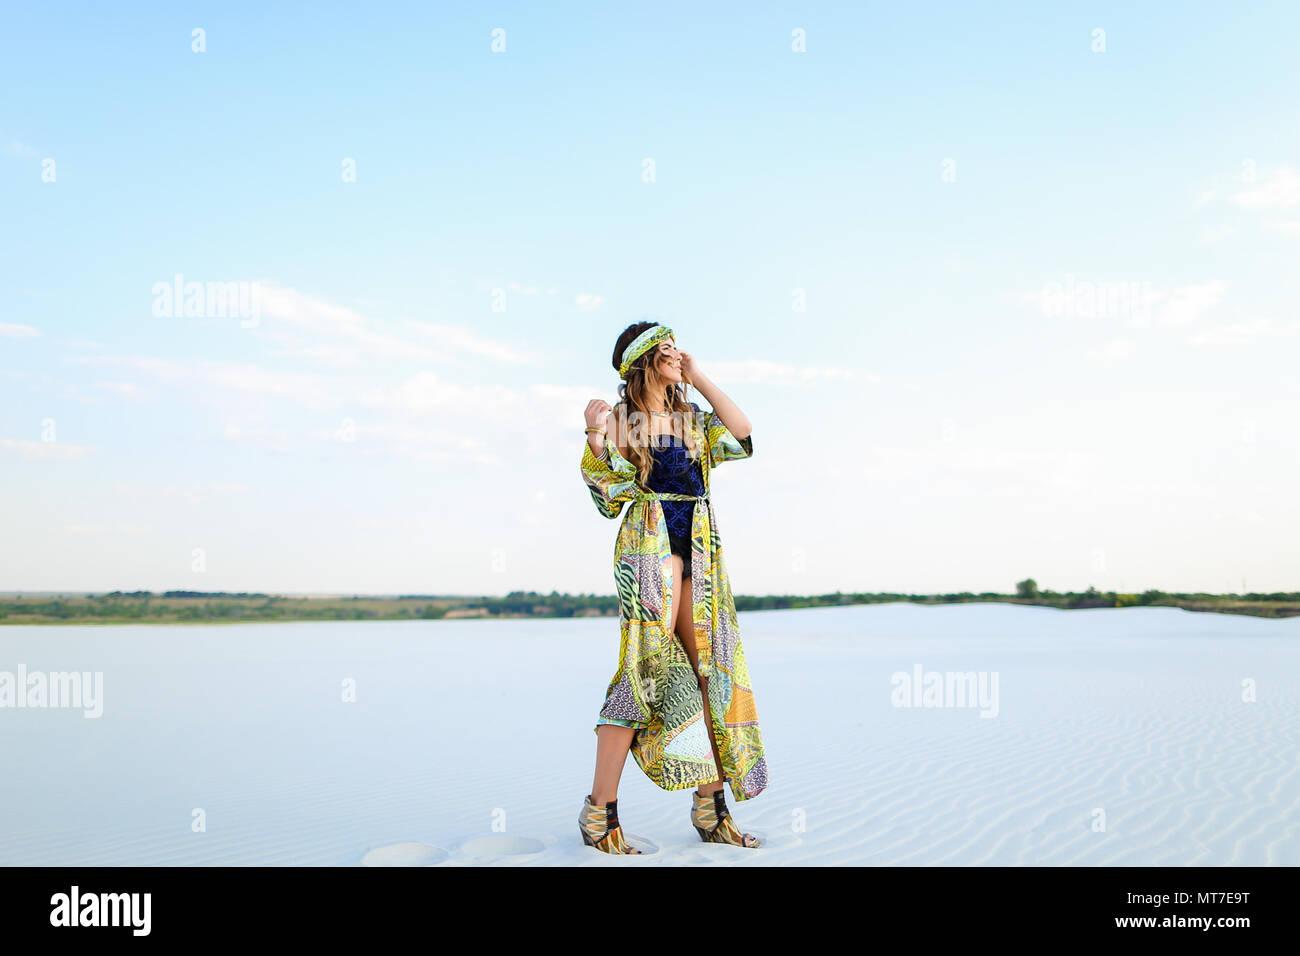 Female european photo model wearing black swimsuit and green bea - Stock Image